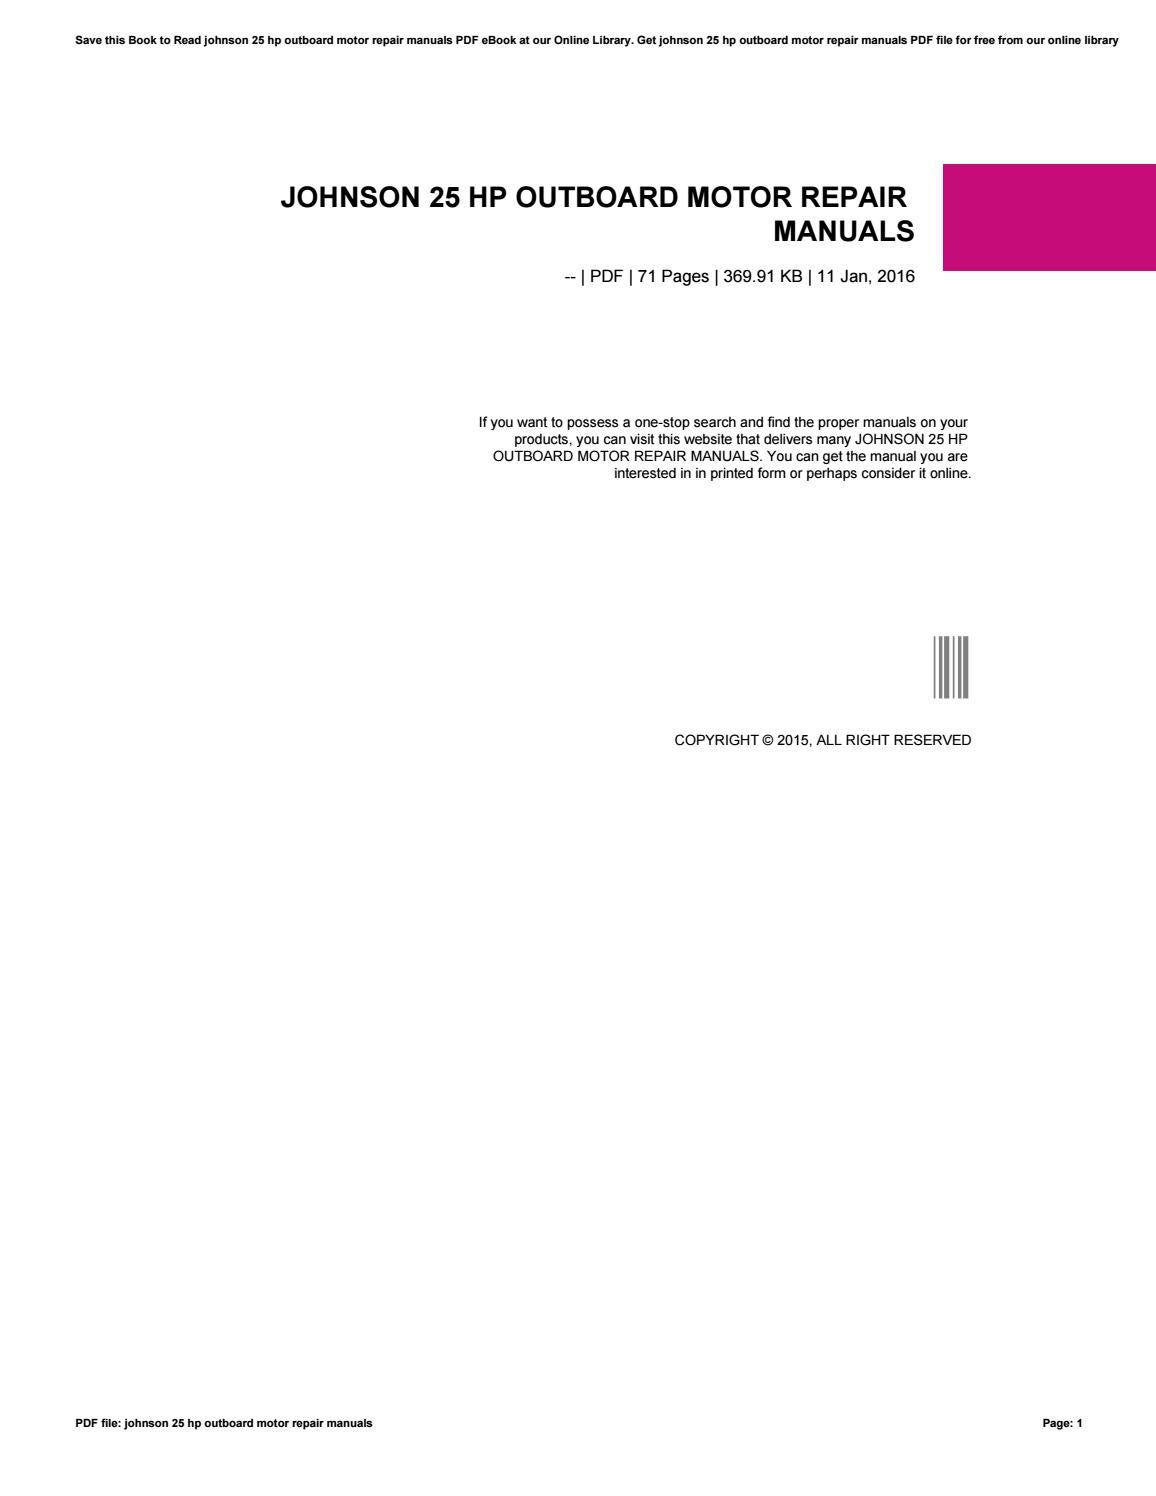 ... Array - 25 hp johnson outboard motor repair manual motorssite org rh  motorssite org